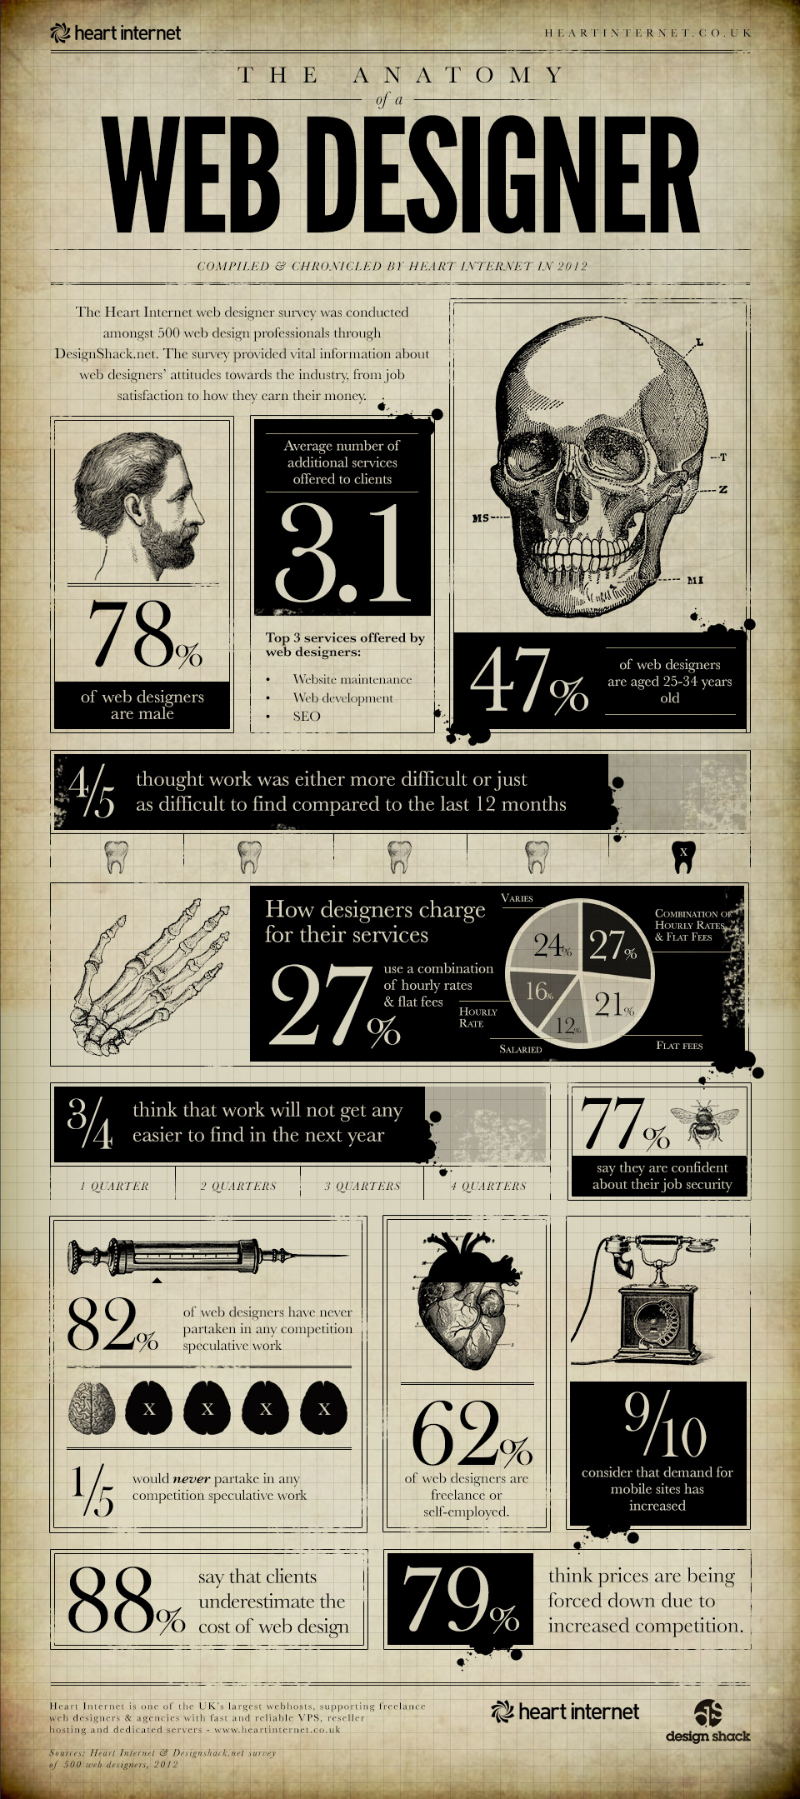 Anatomy-of-a-Web-Designer